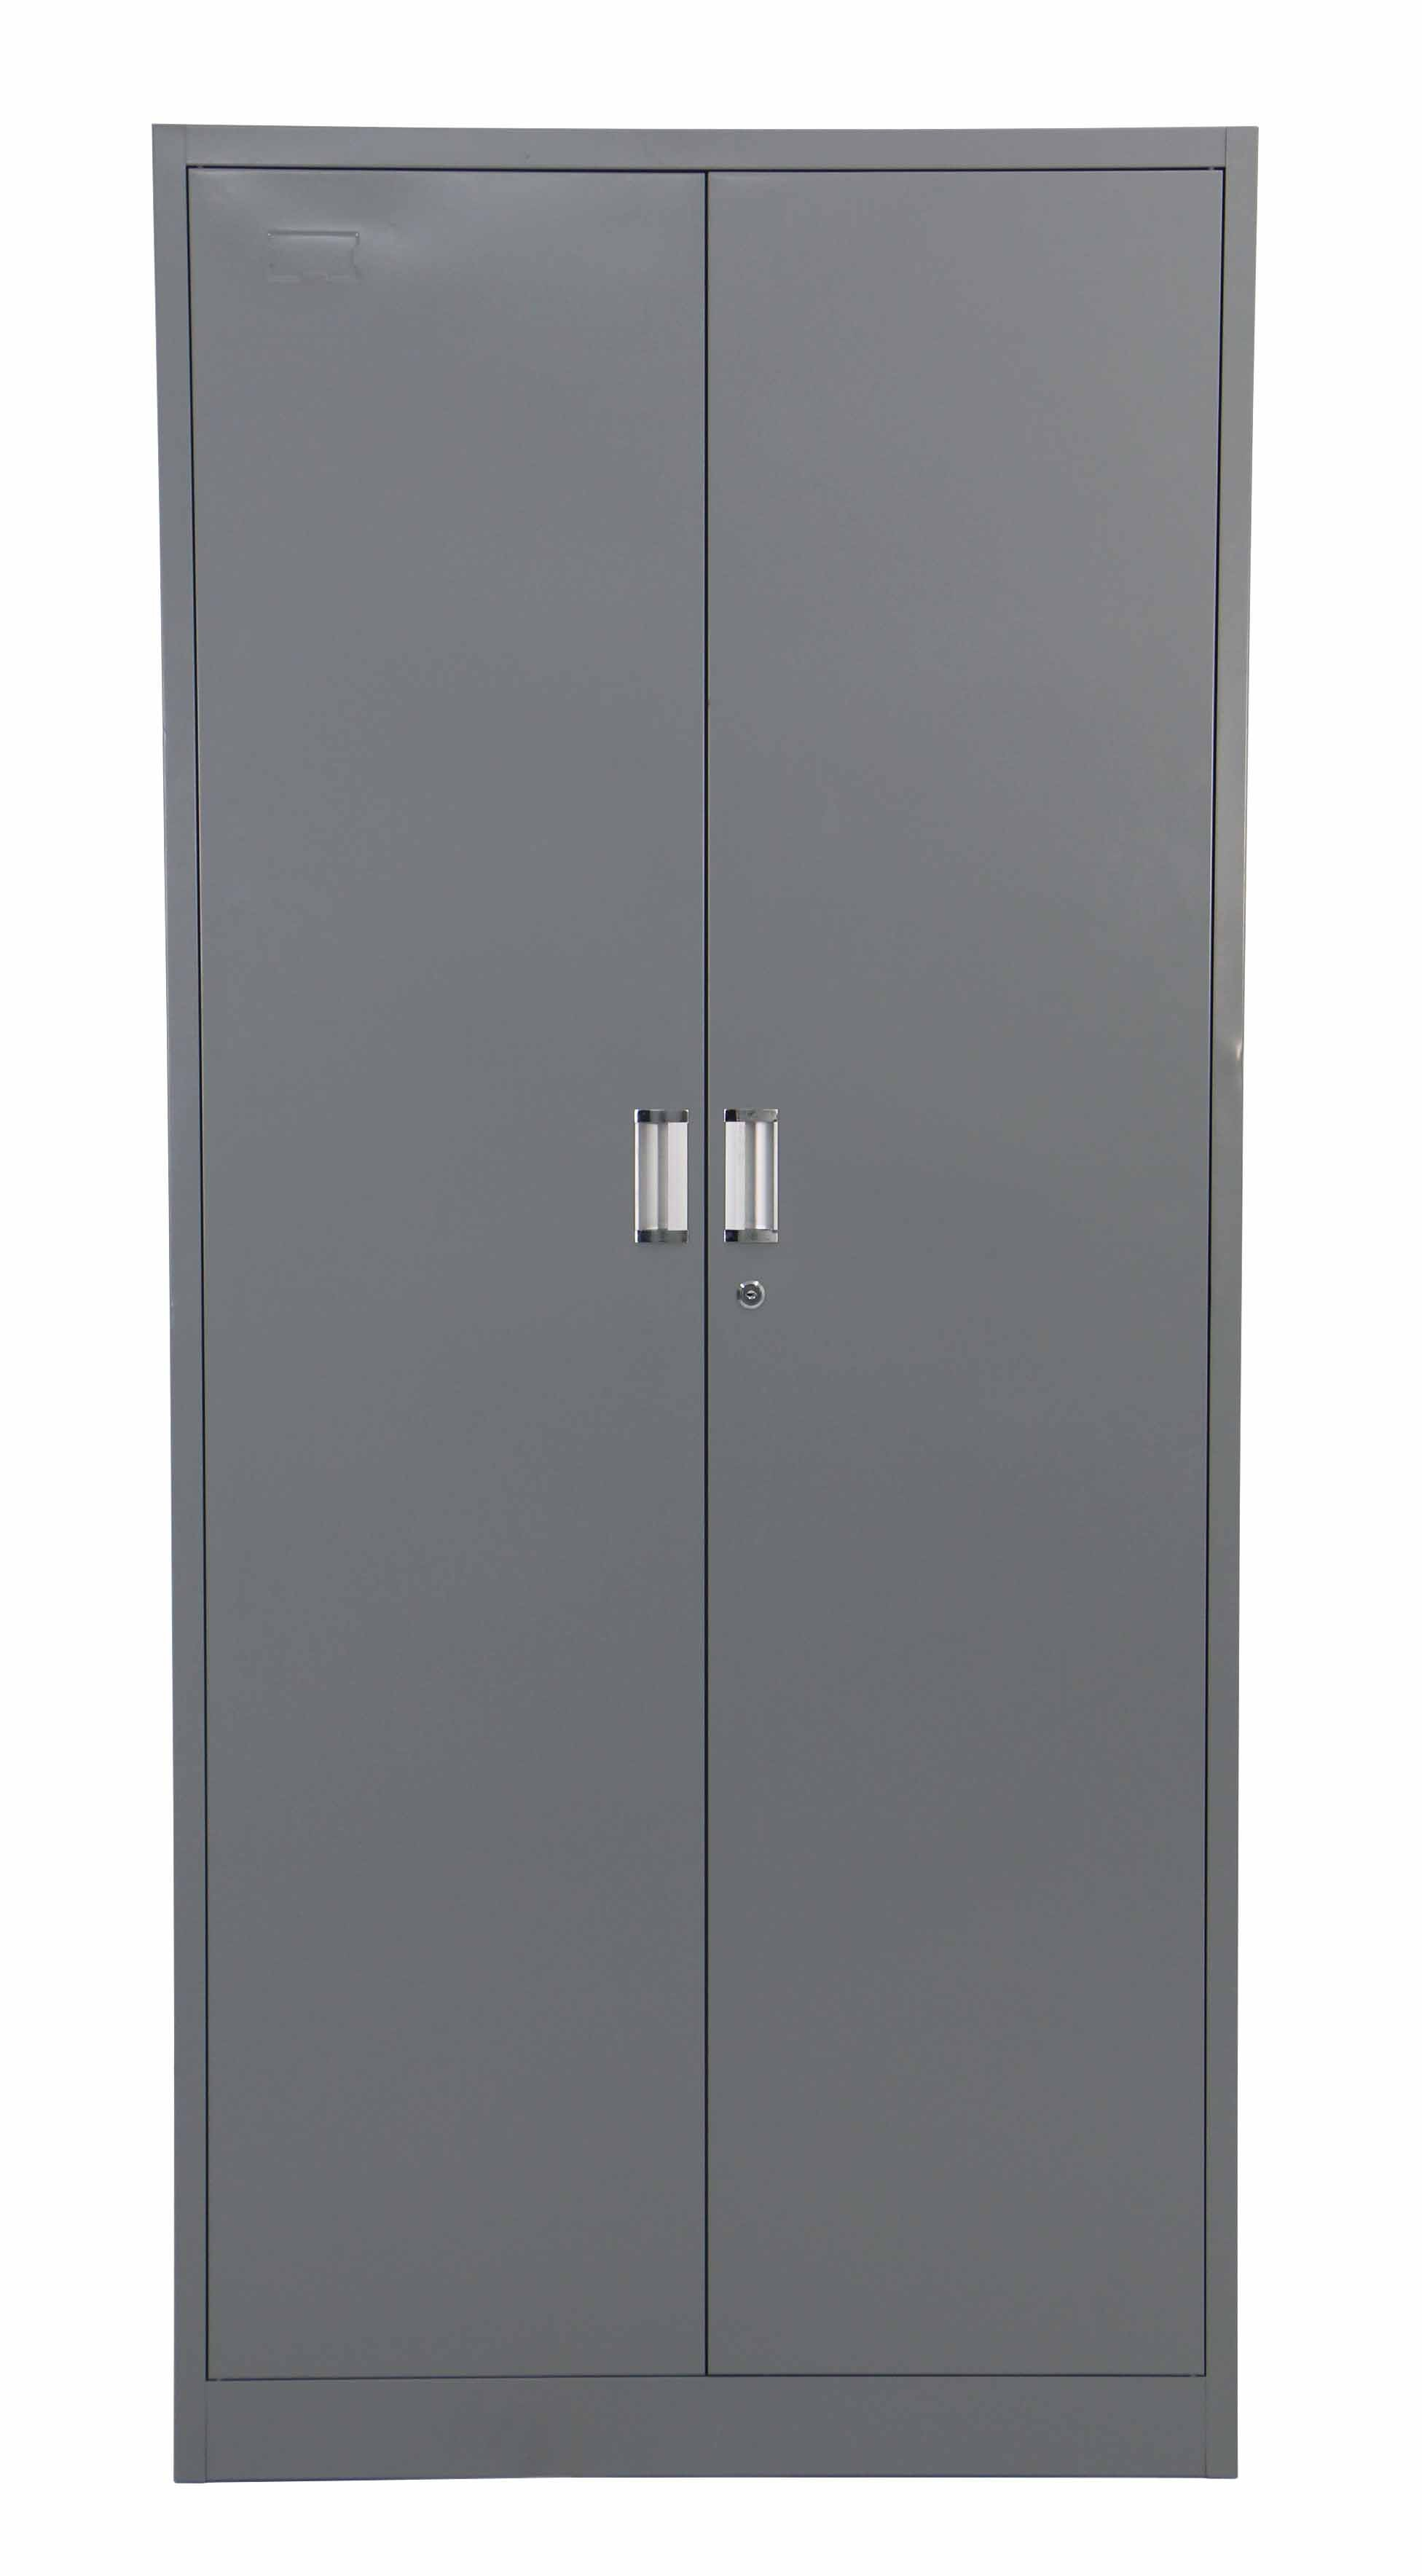 metal wardrobe itm furniture storage rack clothes organizer bedroom closet silver